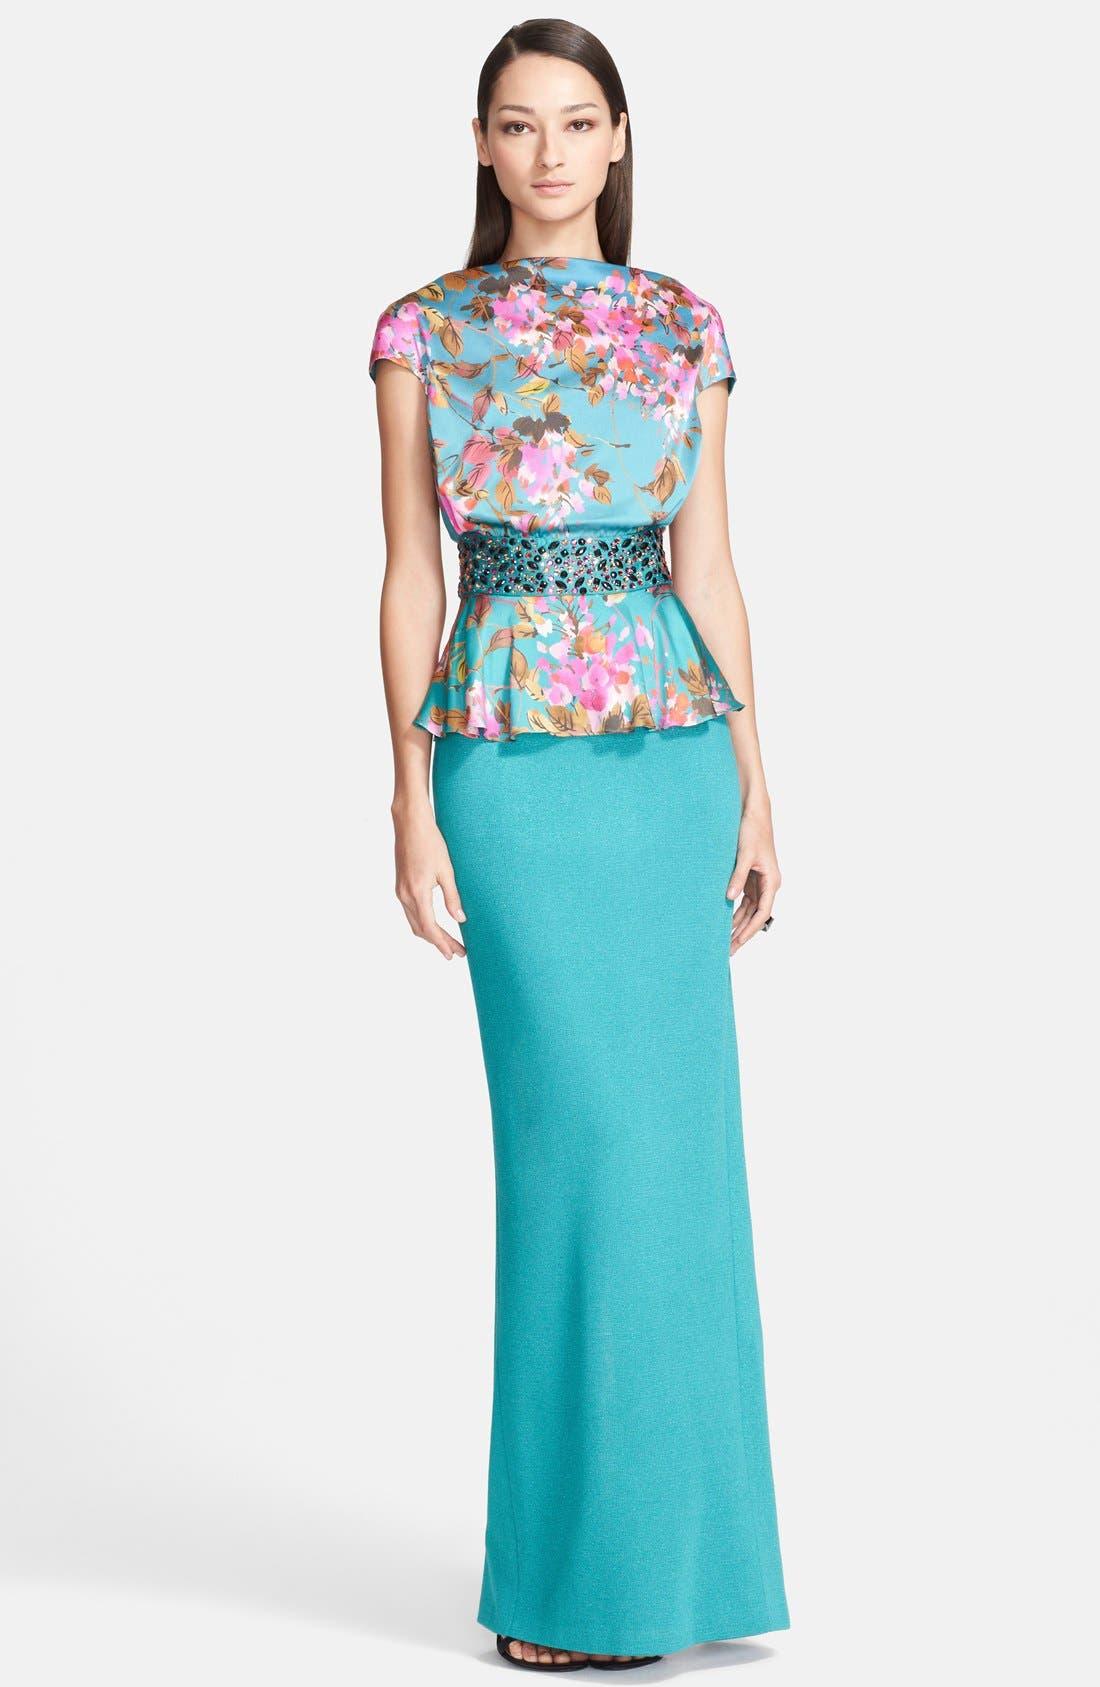 Main Image - St. John Collection Botanical Dégradé Print Charmeuse & Shimmer Milano Knit Gown